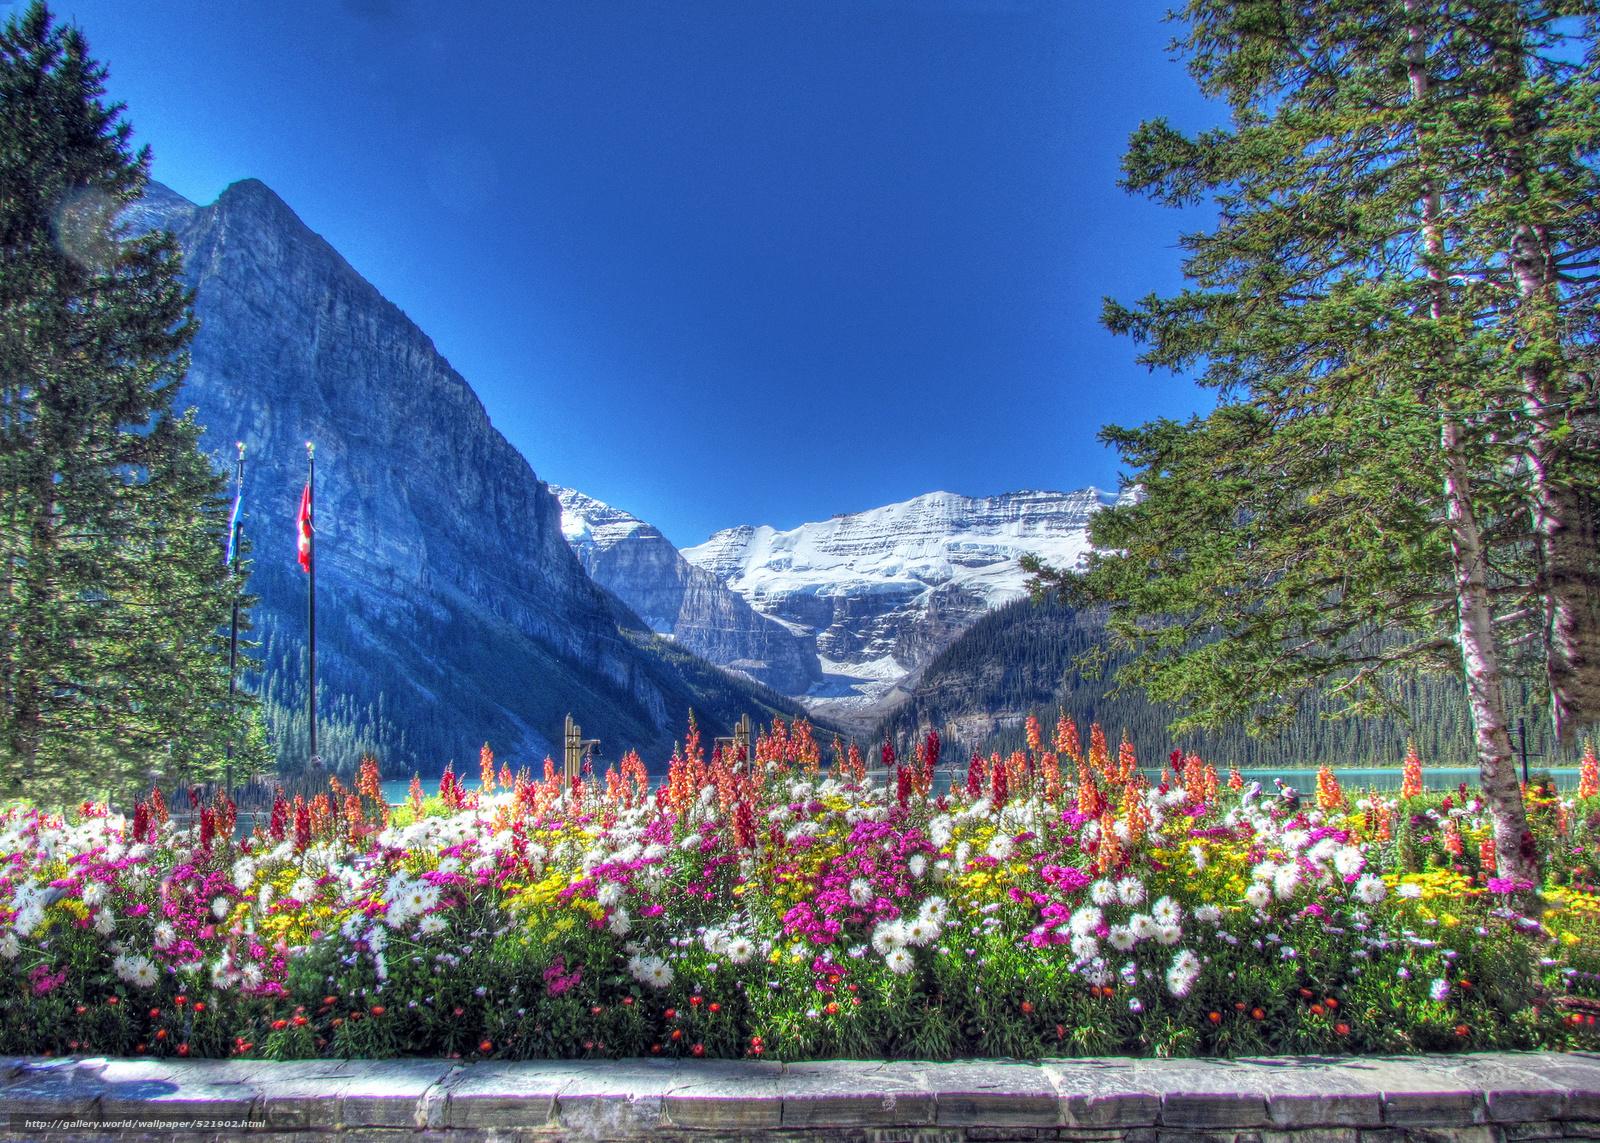 Download wallpaper lake louise canadian rockies banff national park 1600x1143